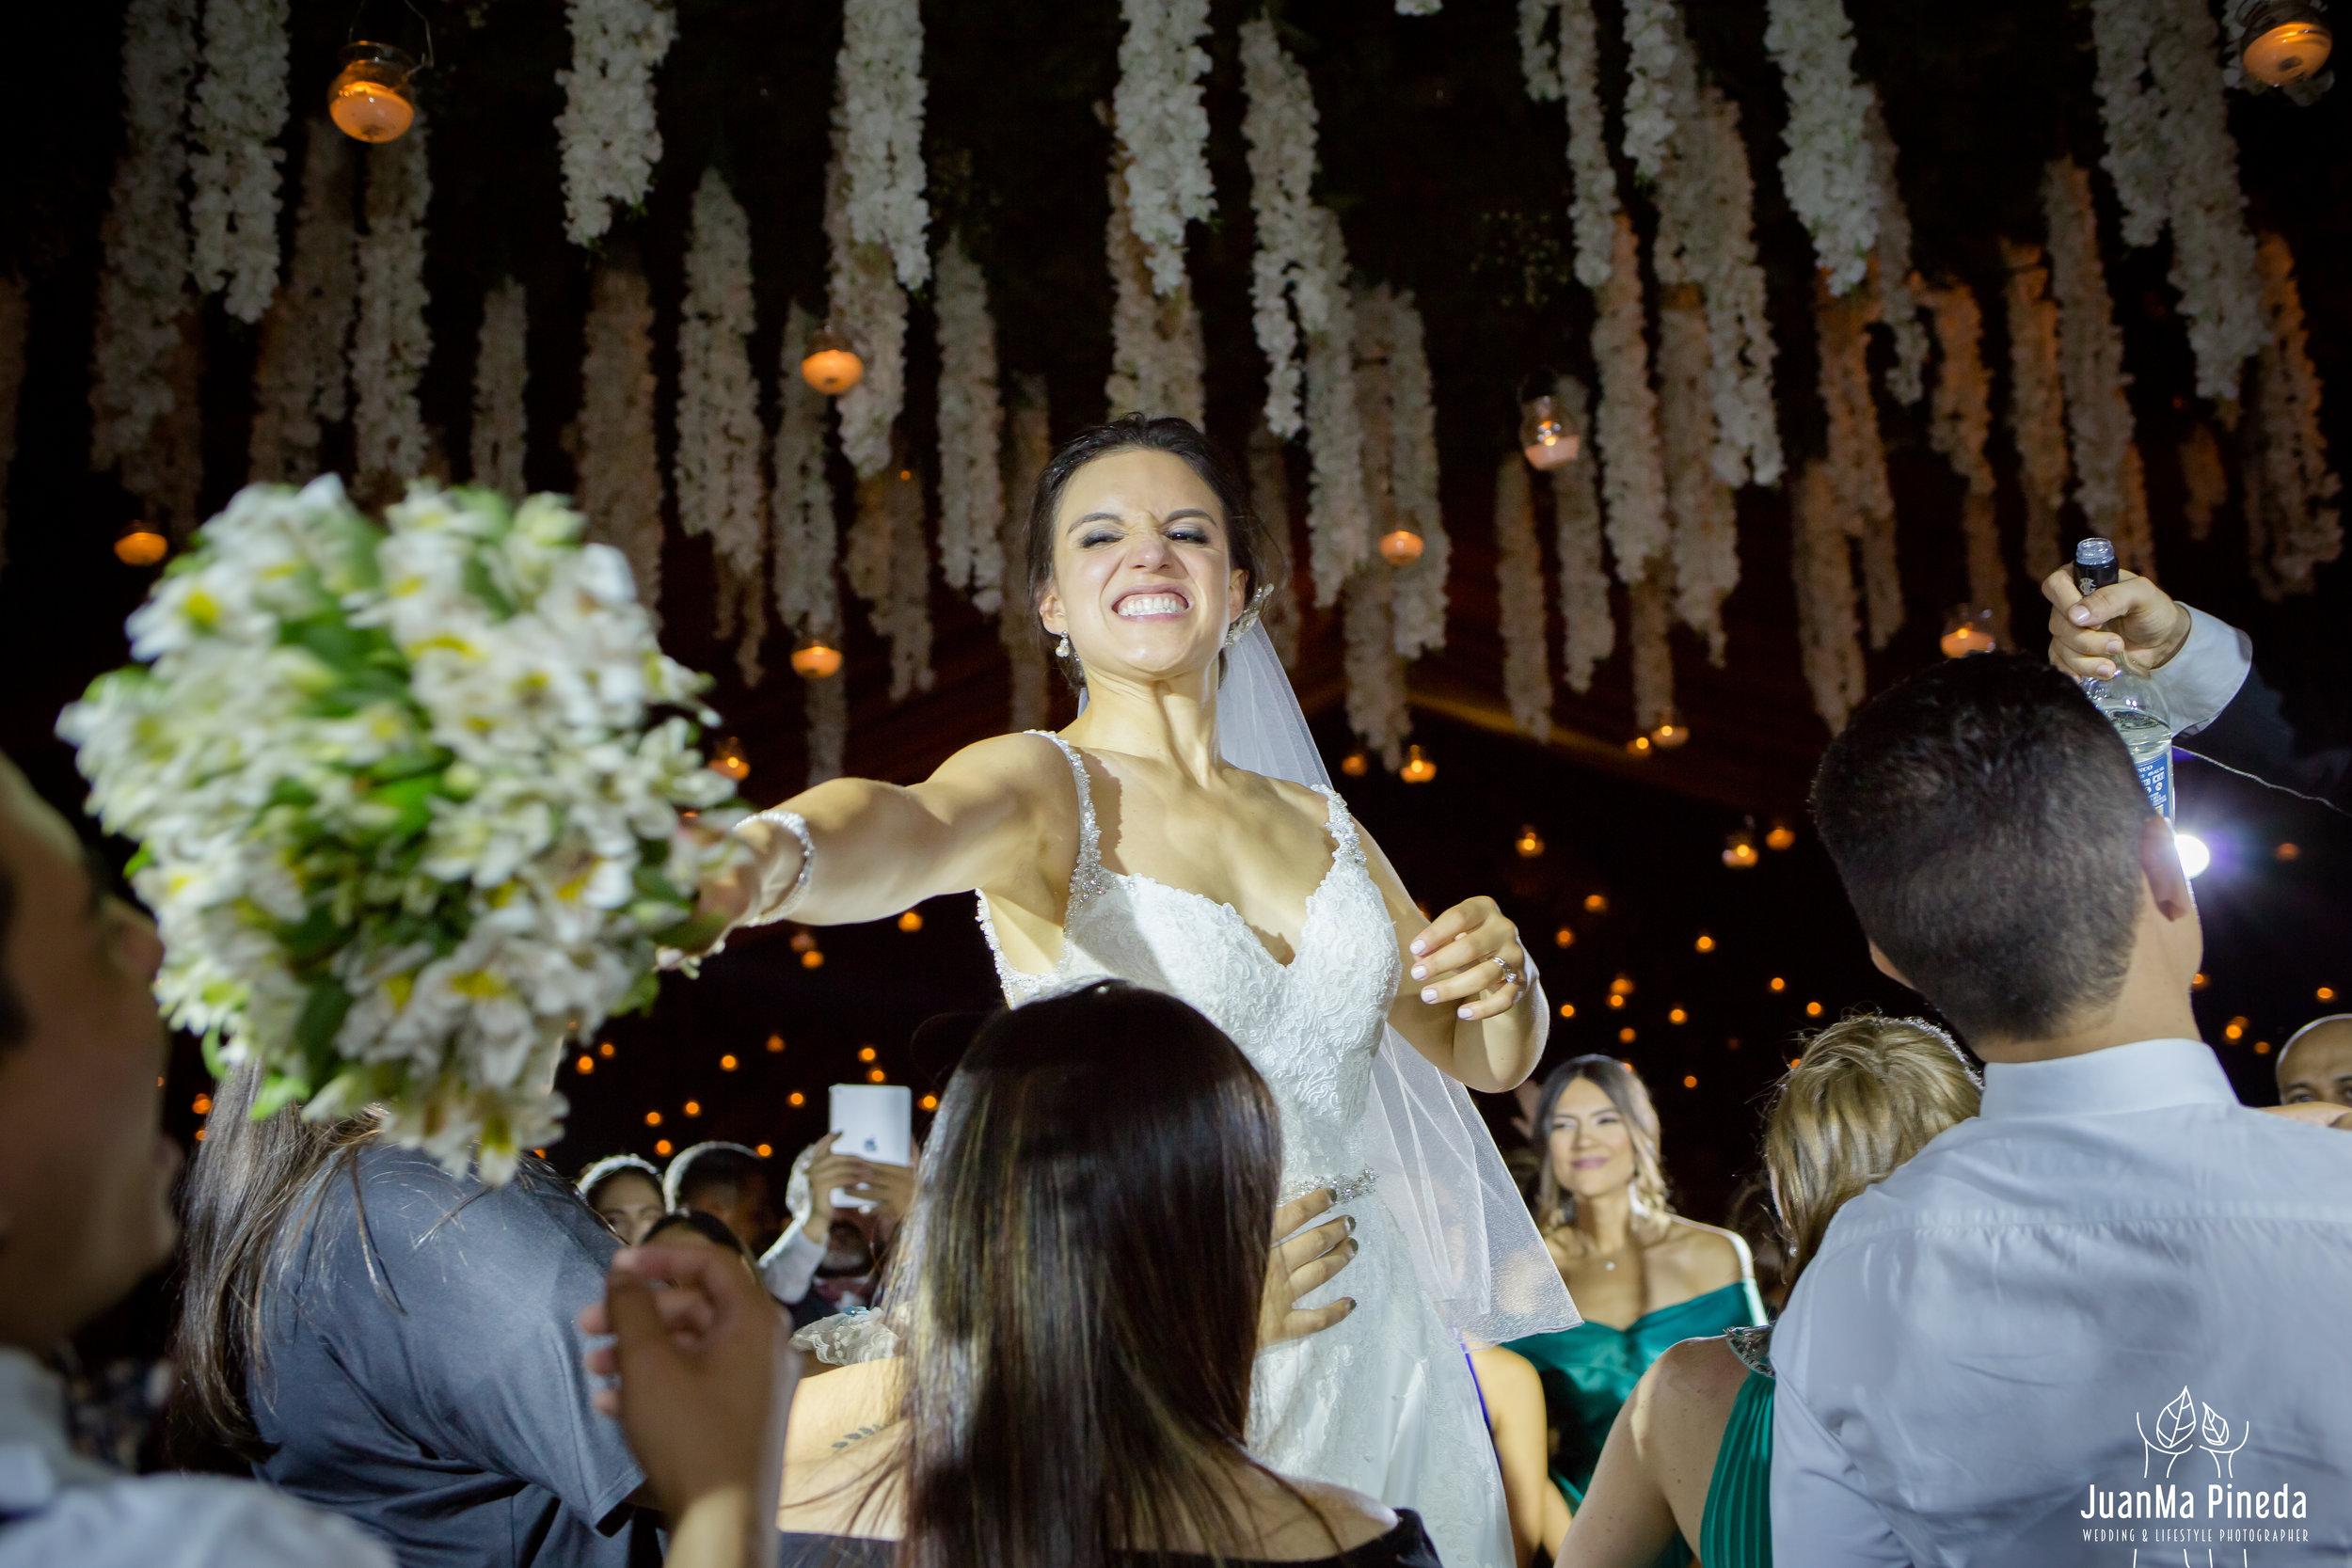 Wedding+Day+Photographer-1-12.jpg